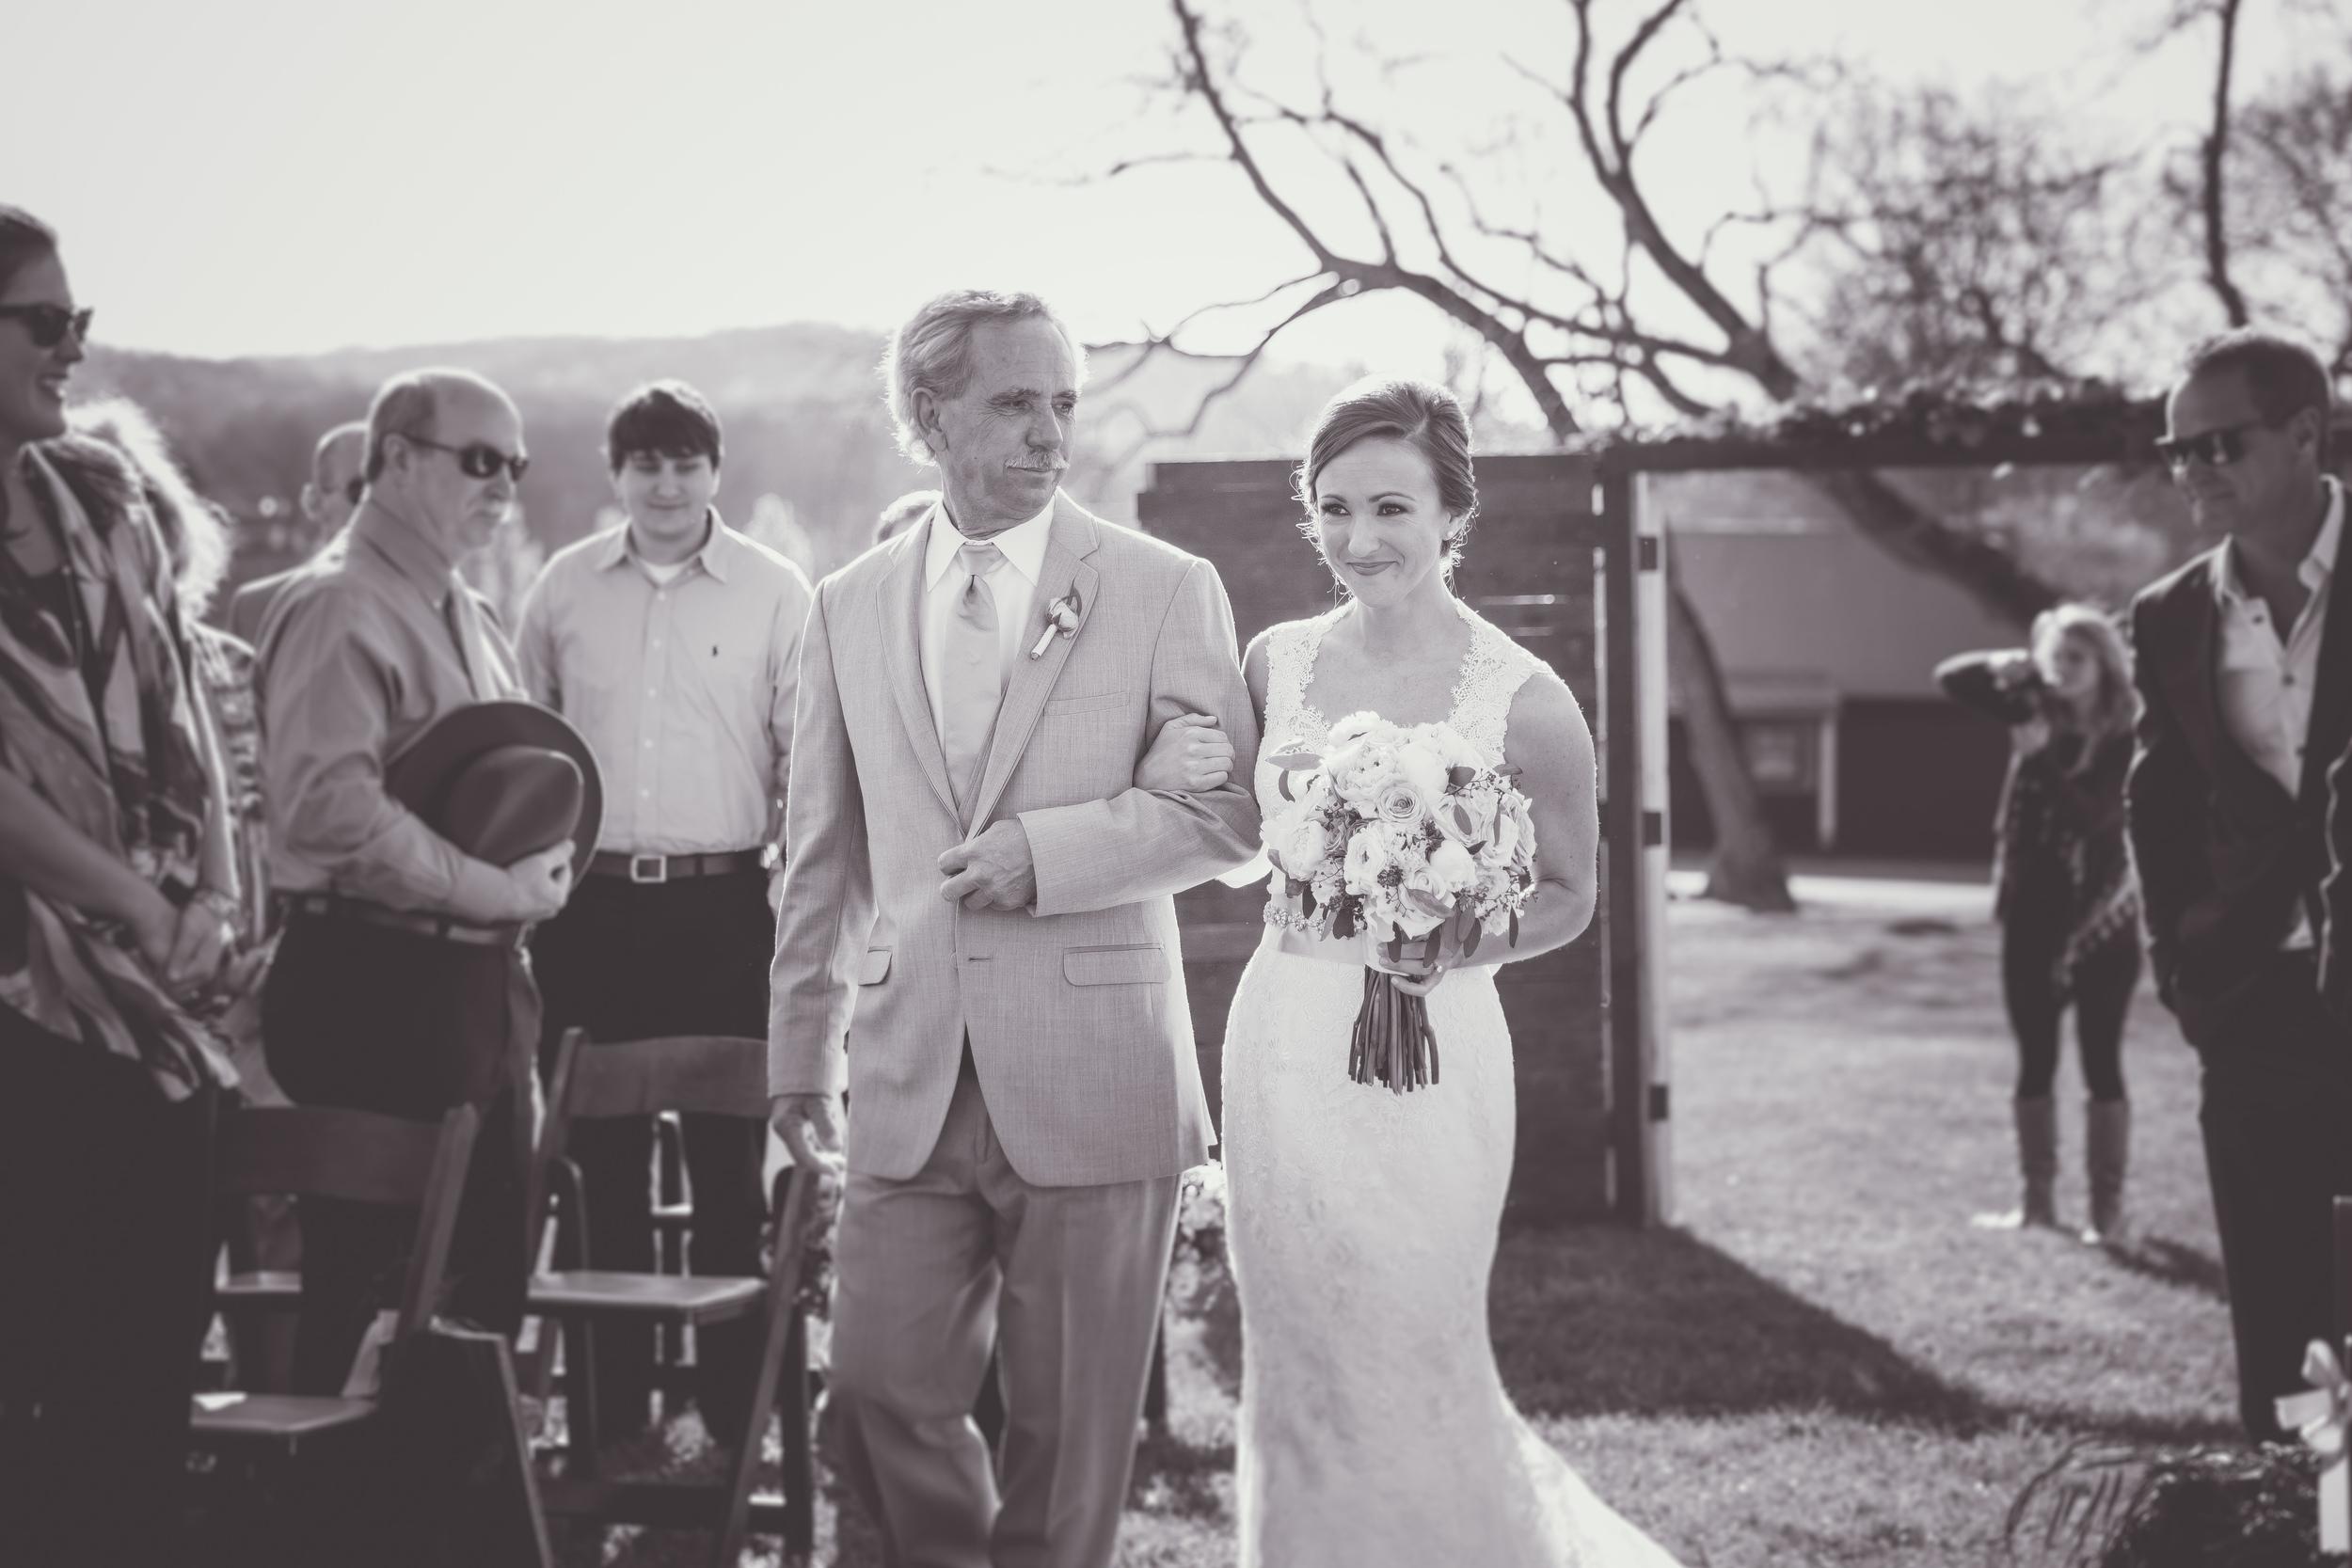 memphis-wedding-photography-pricing